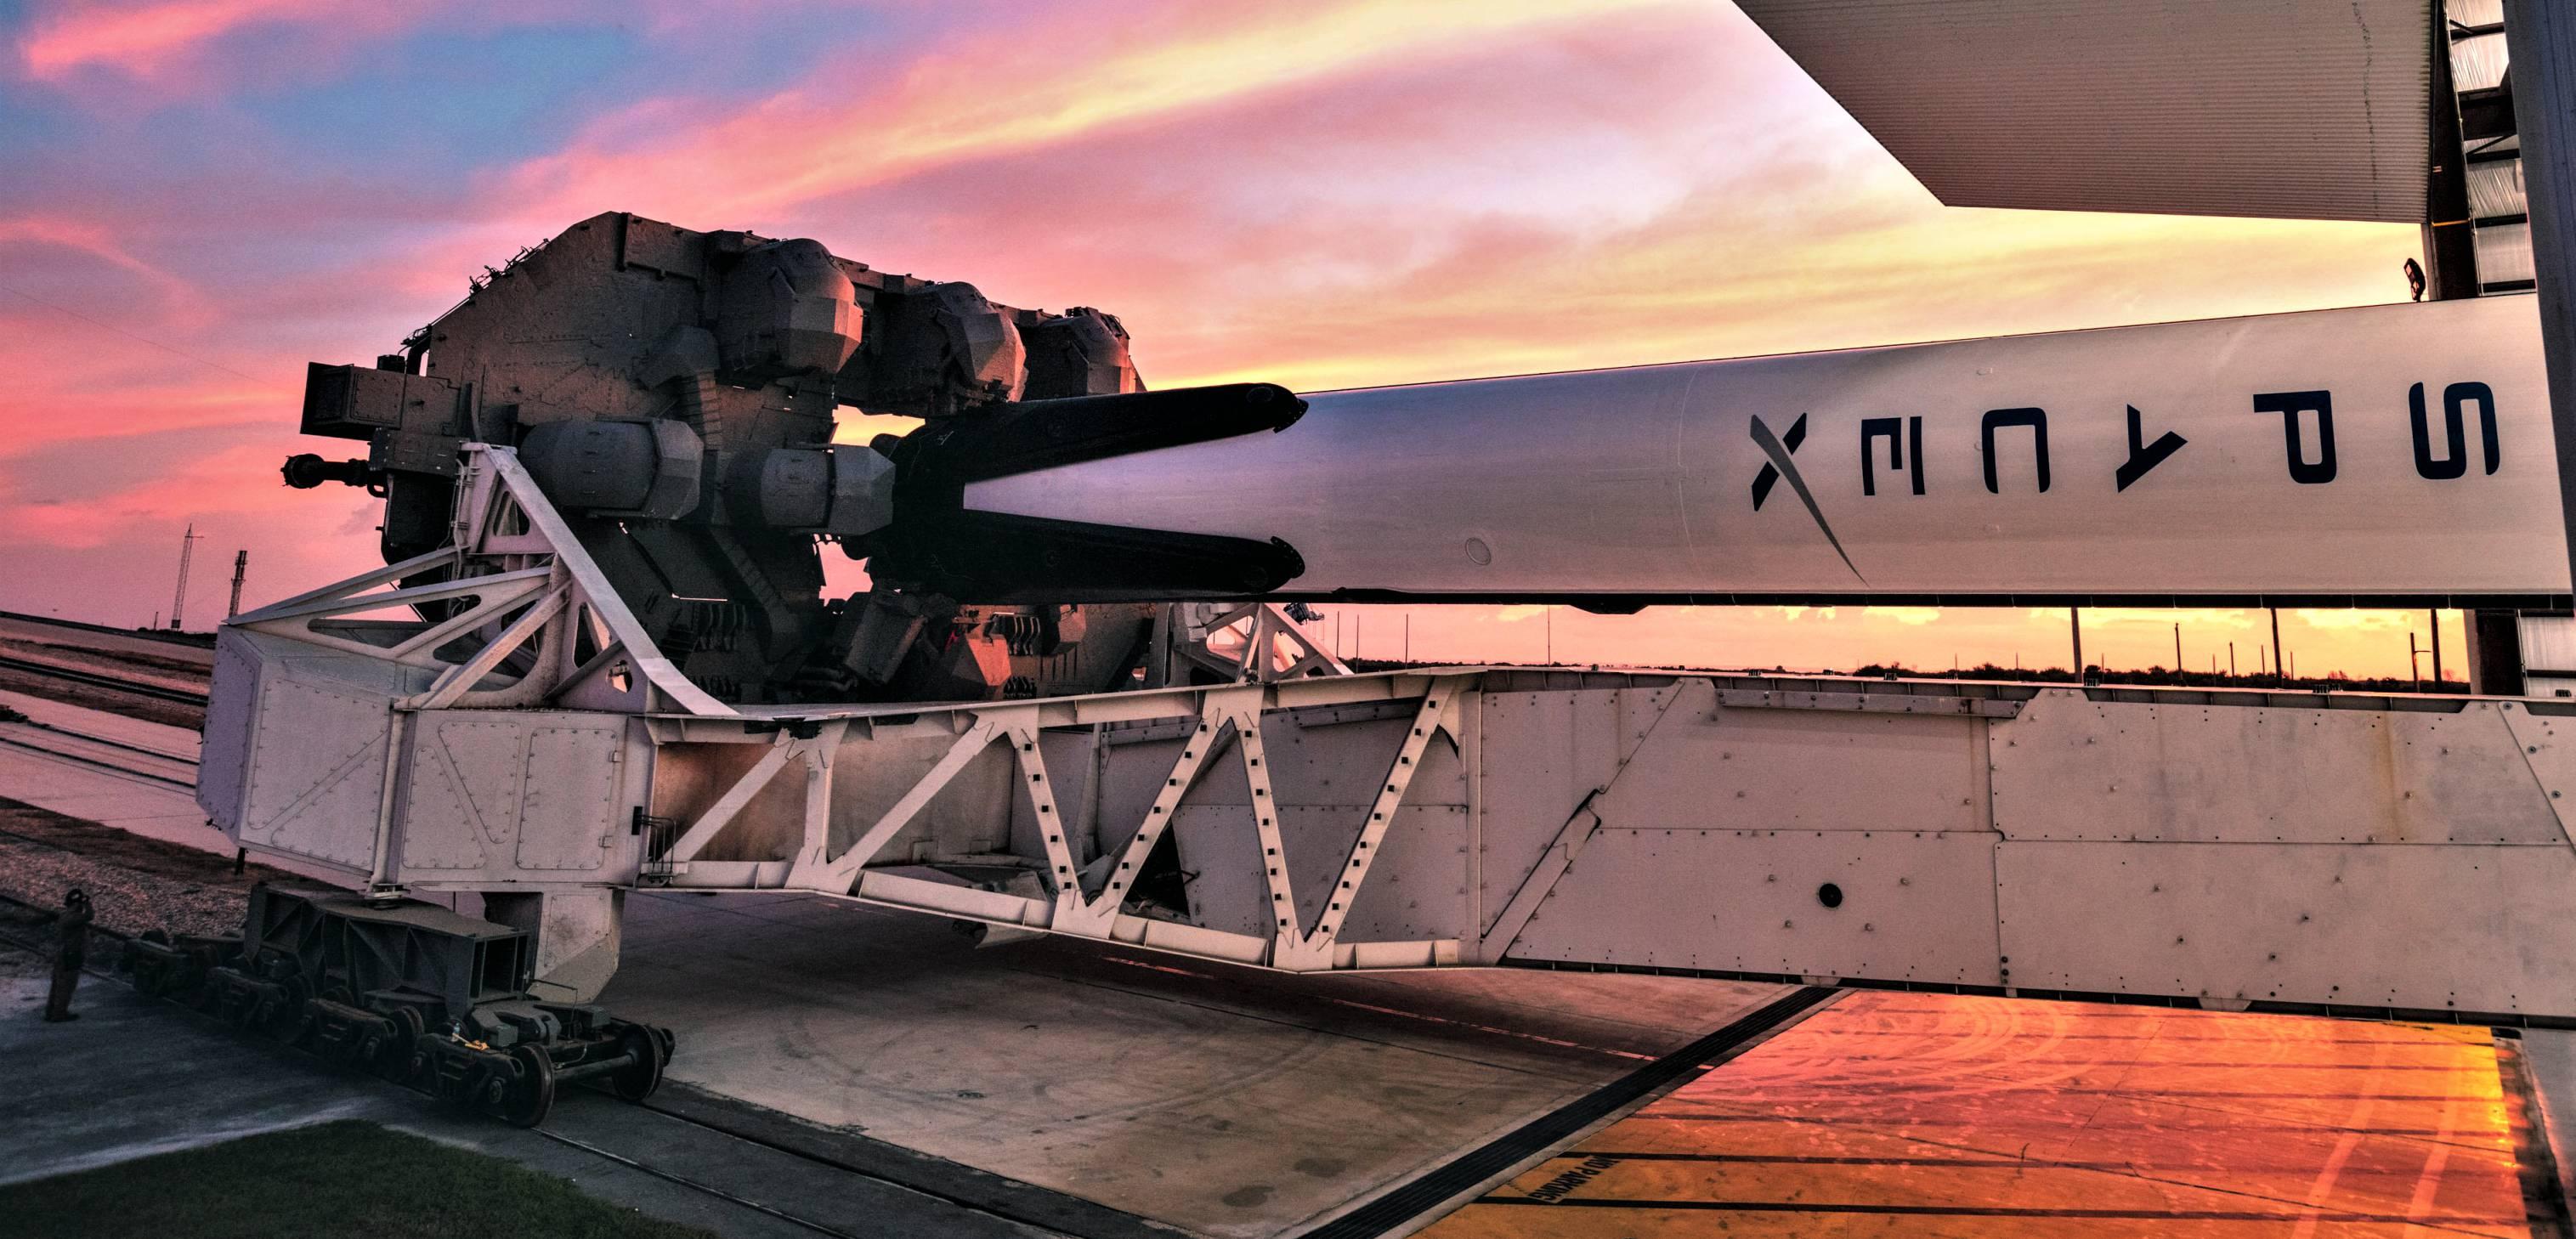 Crew Dragon DM-1 Falcon 9 B1051 rollout (SpaceX) 2 crop(c)